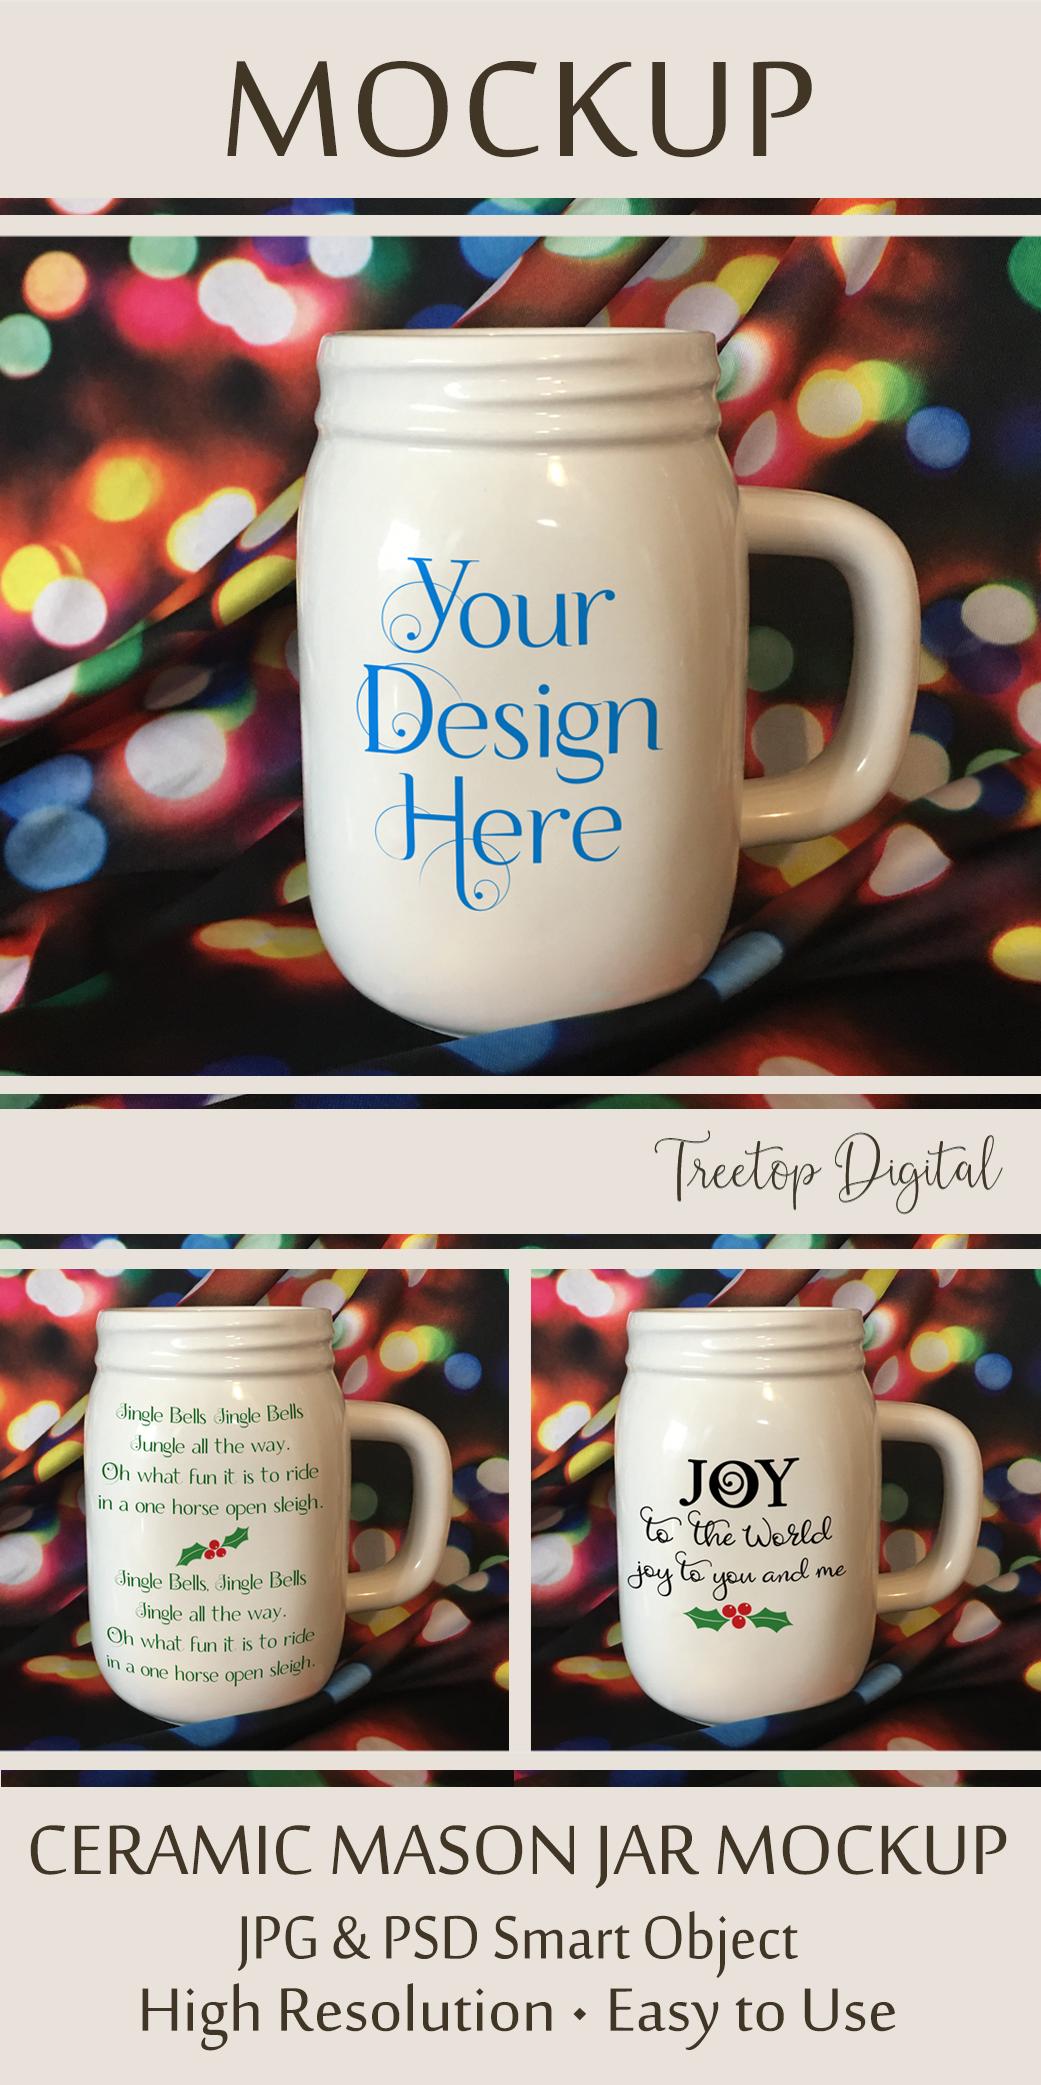 Mason Jar Mug Christmas Mockup, PSD Smart Object & JPG example image 7